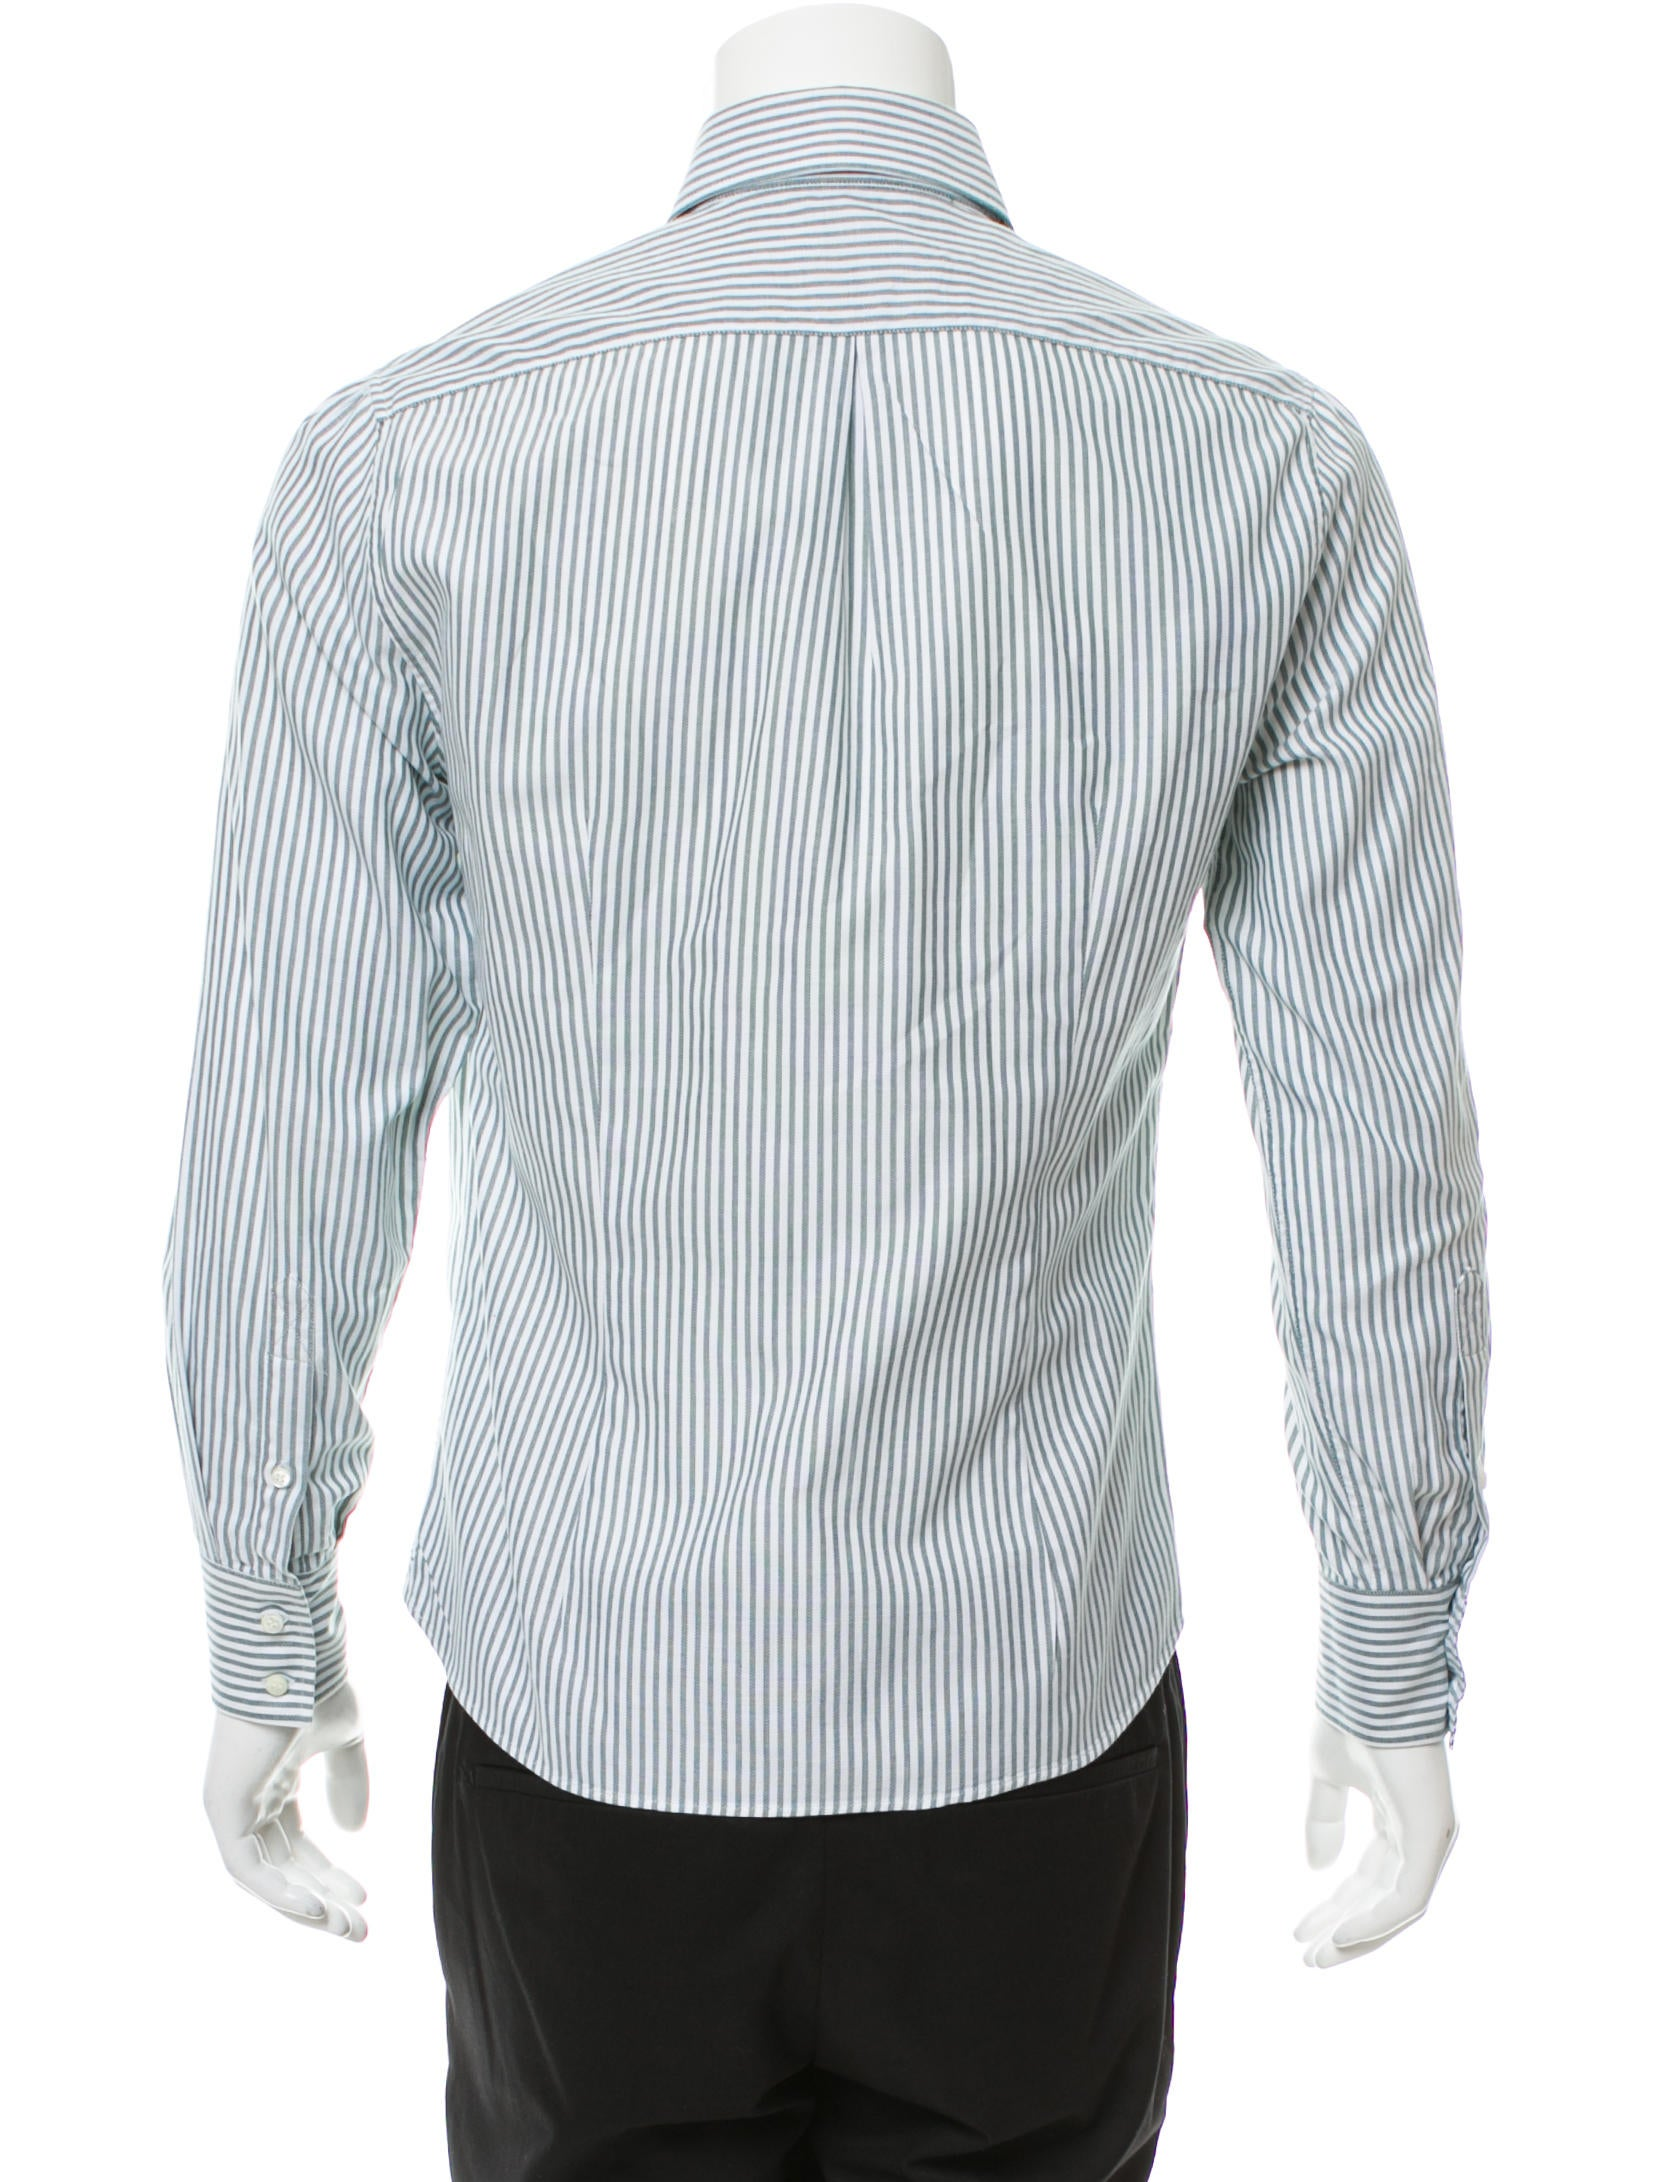 Brunello cucinelli striped button up shirt clothing for Striped button up shirt mens